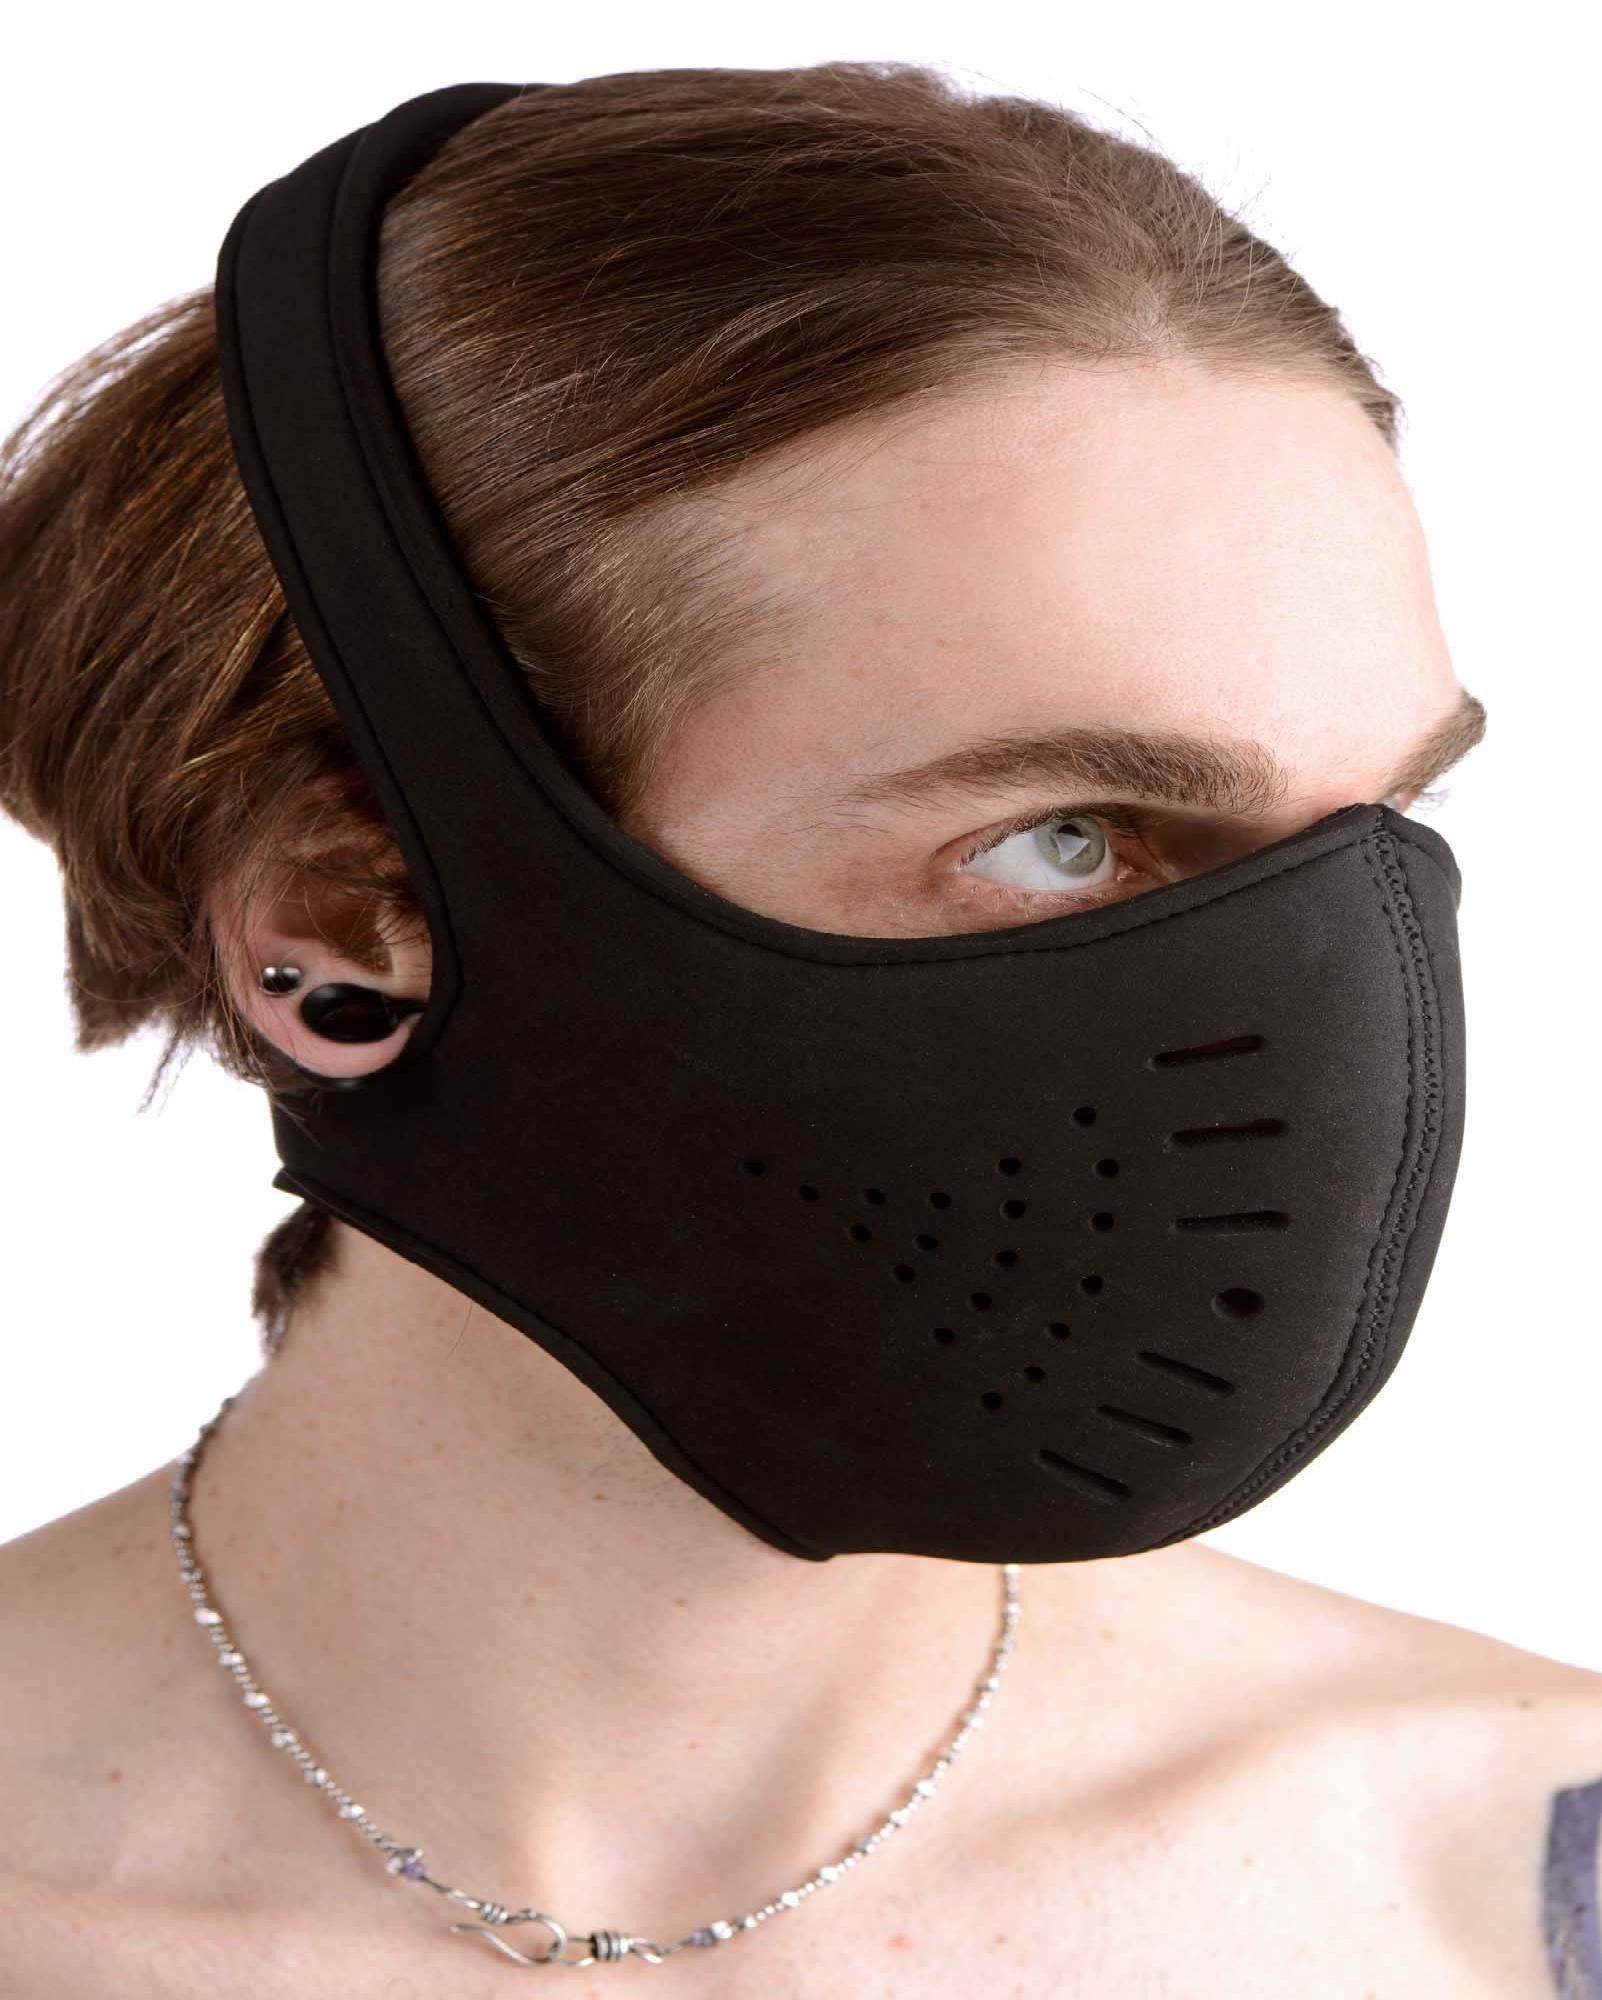 Neoprene Snap On Face Mask (With images) Neoprene, Masks